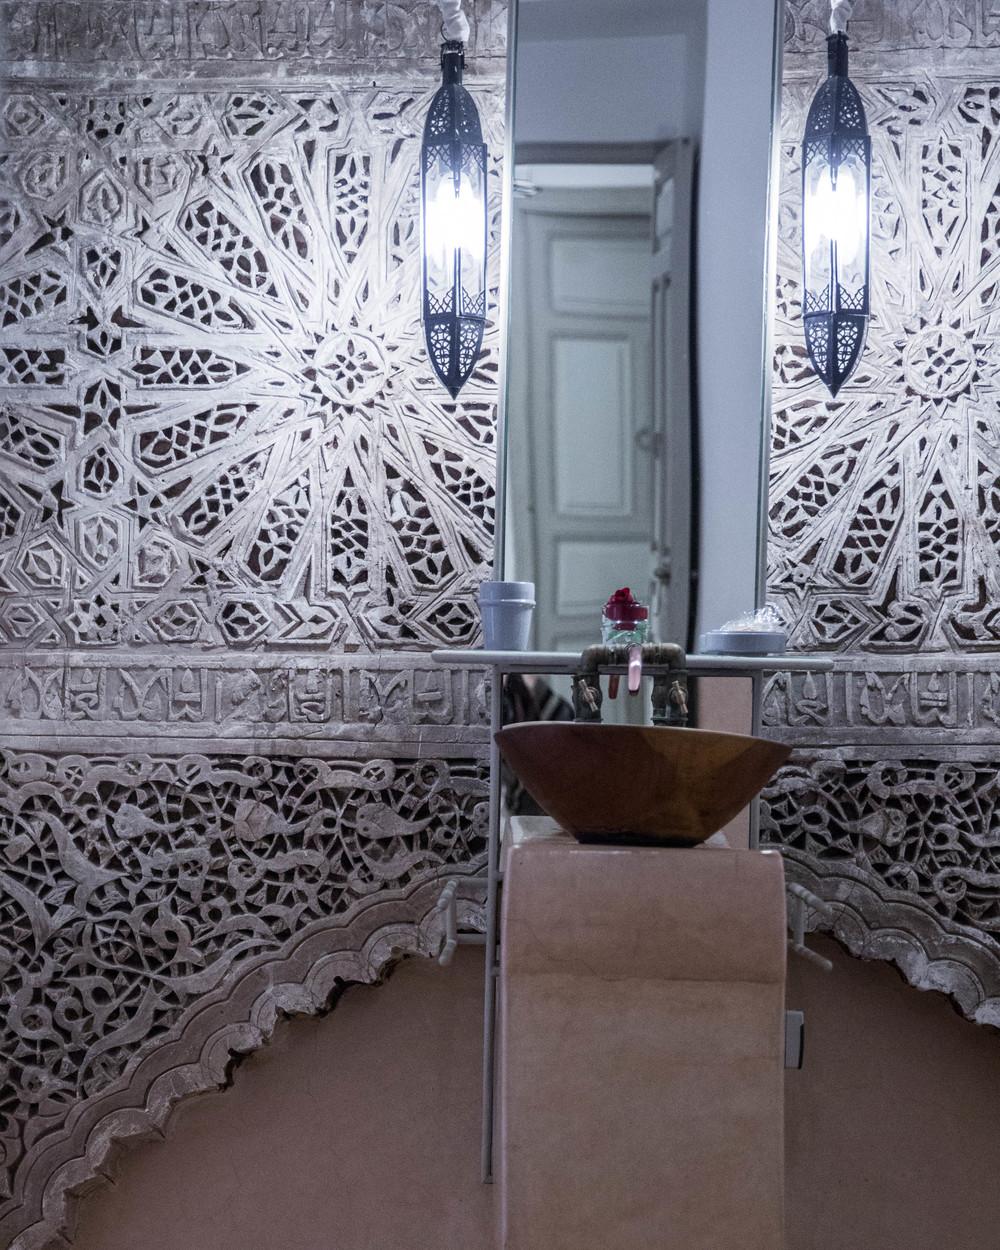 marrakech bathroom.jpg